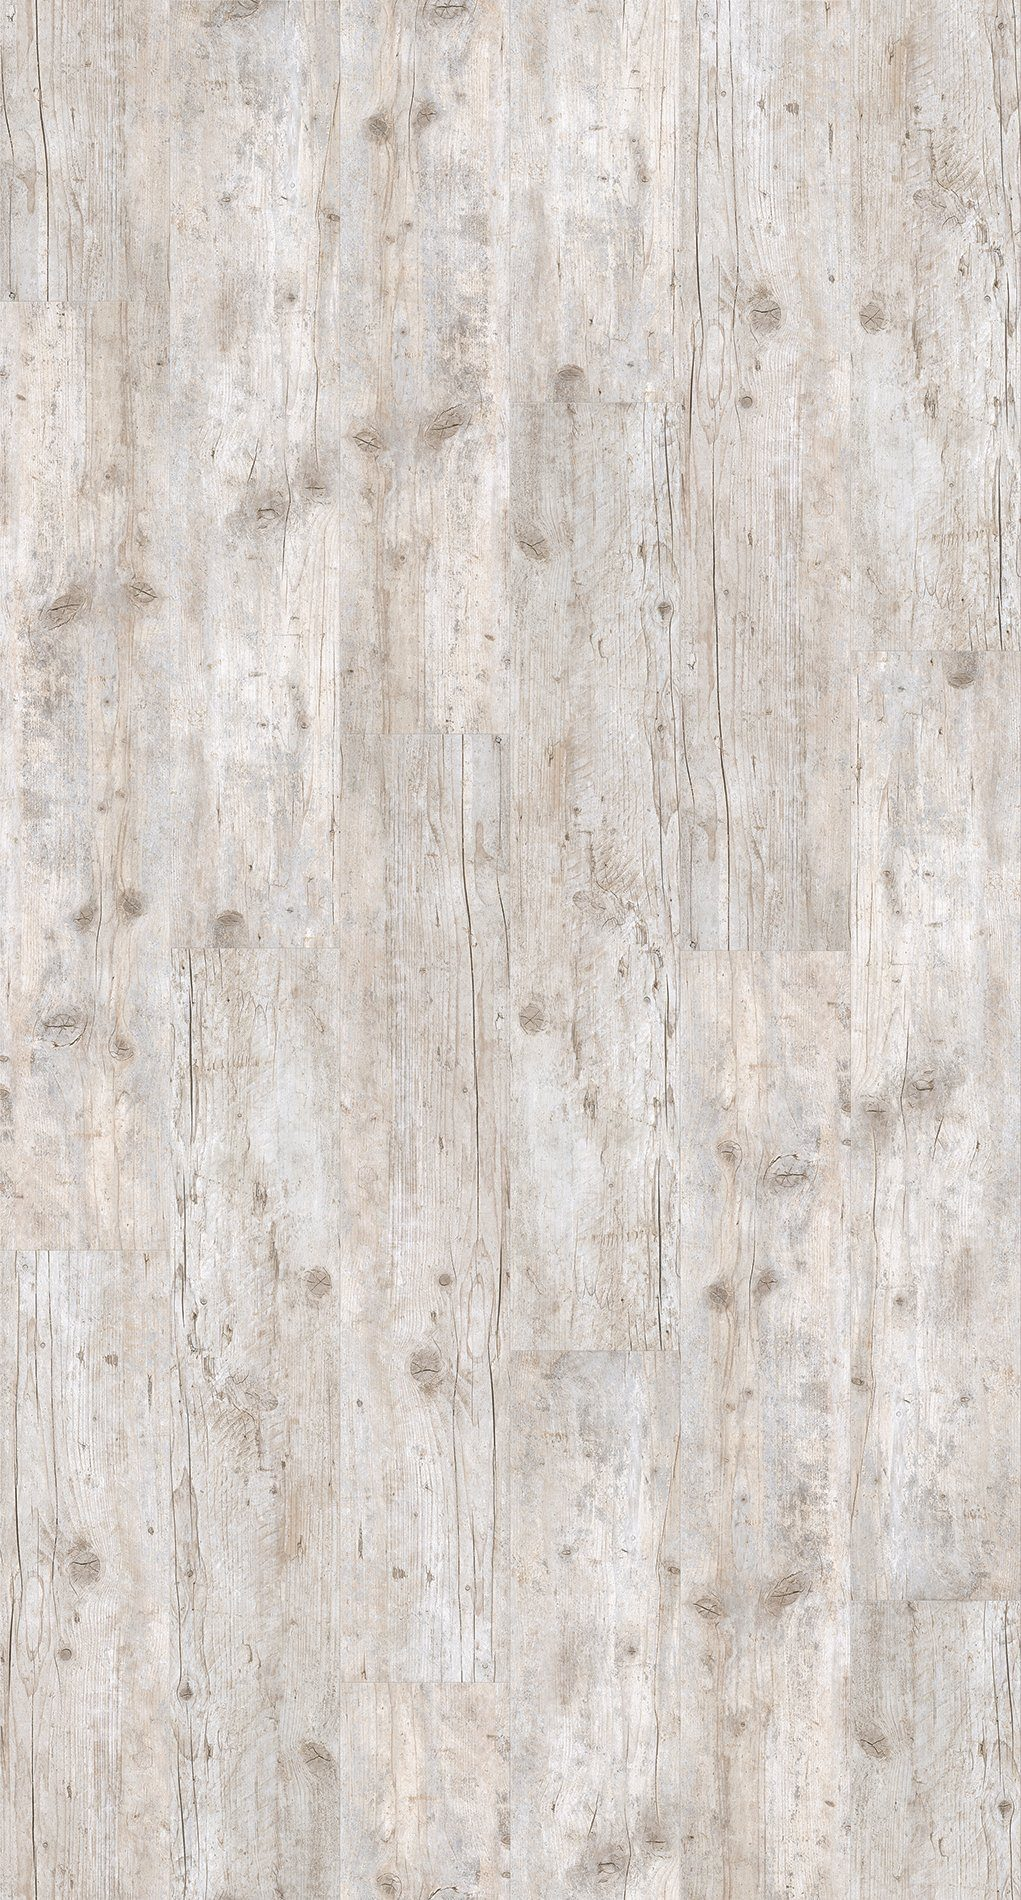 PARADOR Packung: Vinylboden »Classic 2030 - Altholz geweißt«, 1207 x 216 x 8,6 mm, 1,8 m²